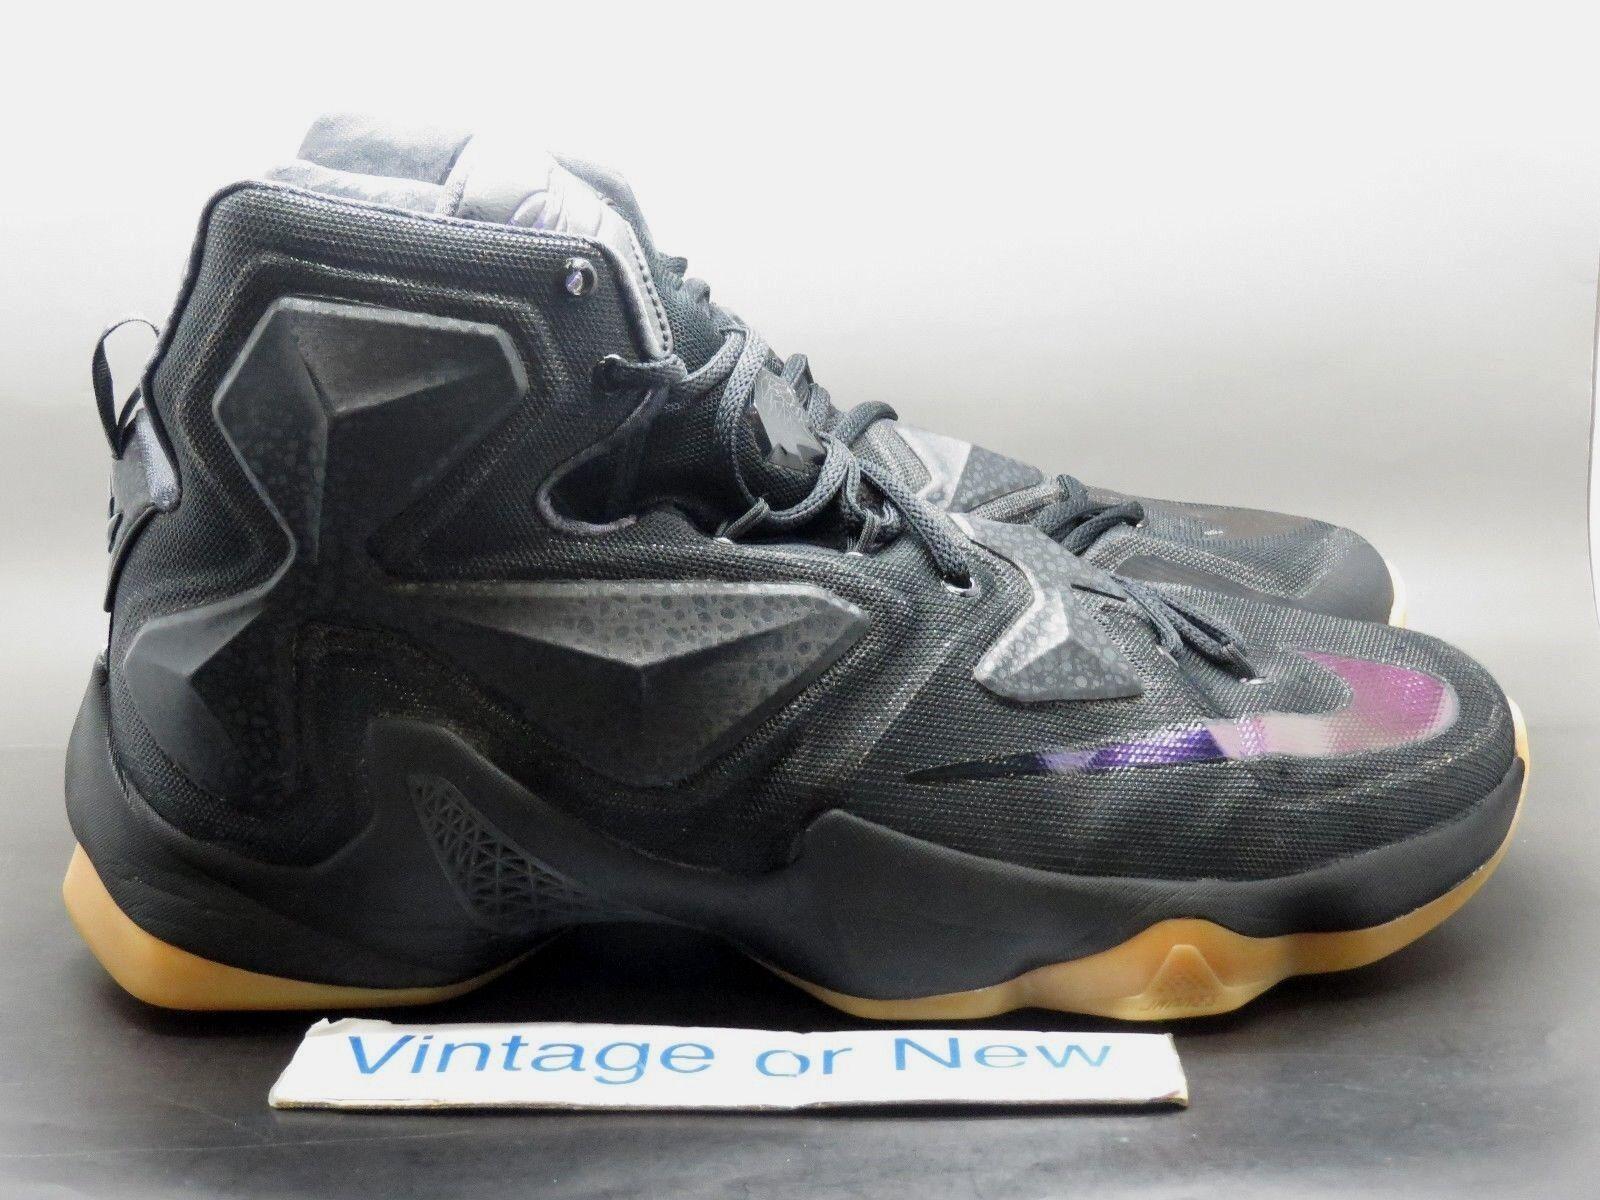 Cheap and beautiful fashion Nike LeBron XIII 13 Black Lion Price reduction